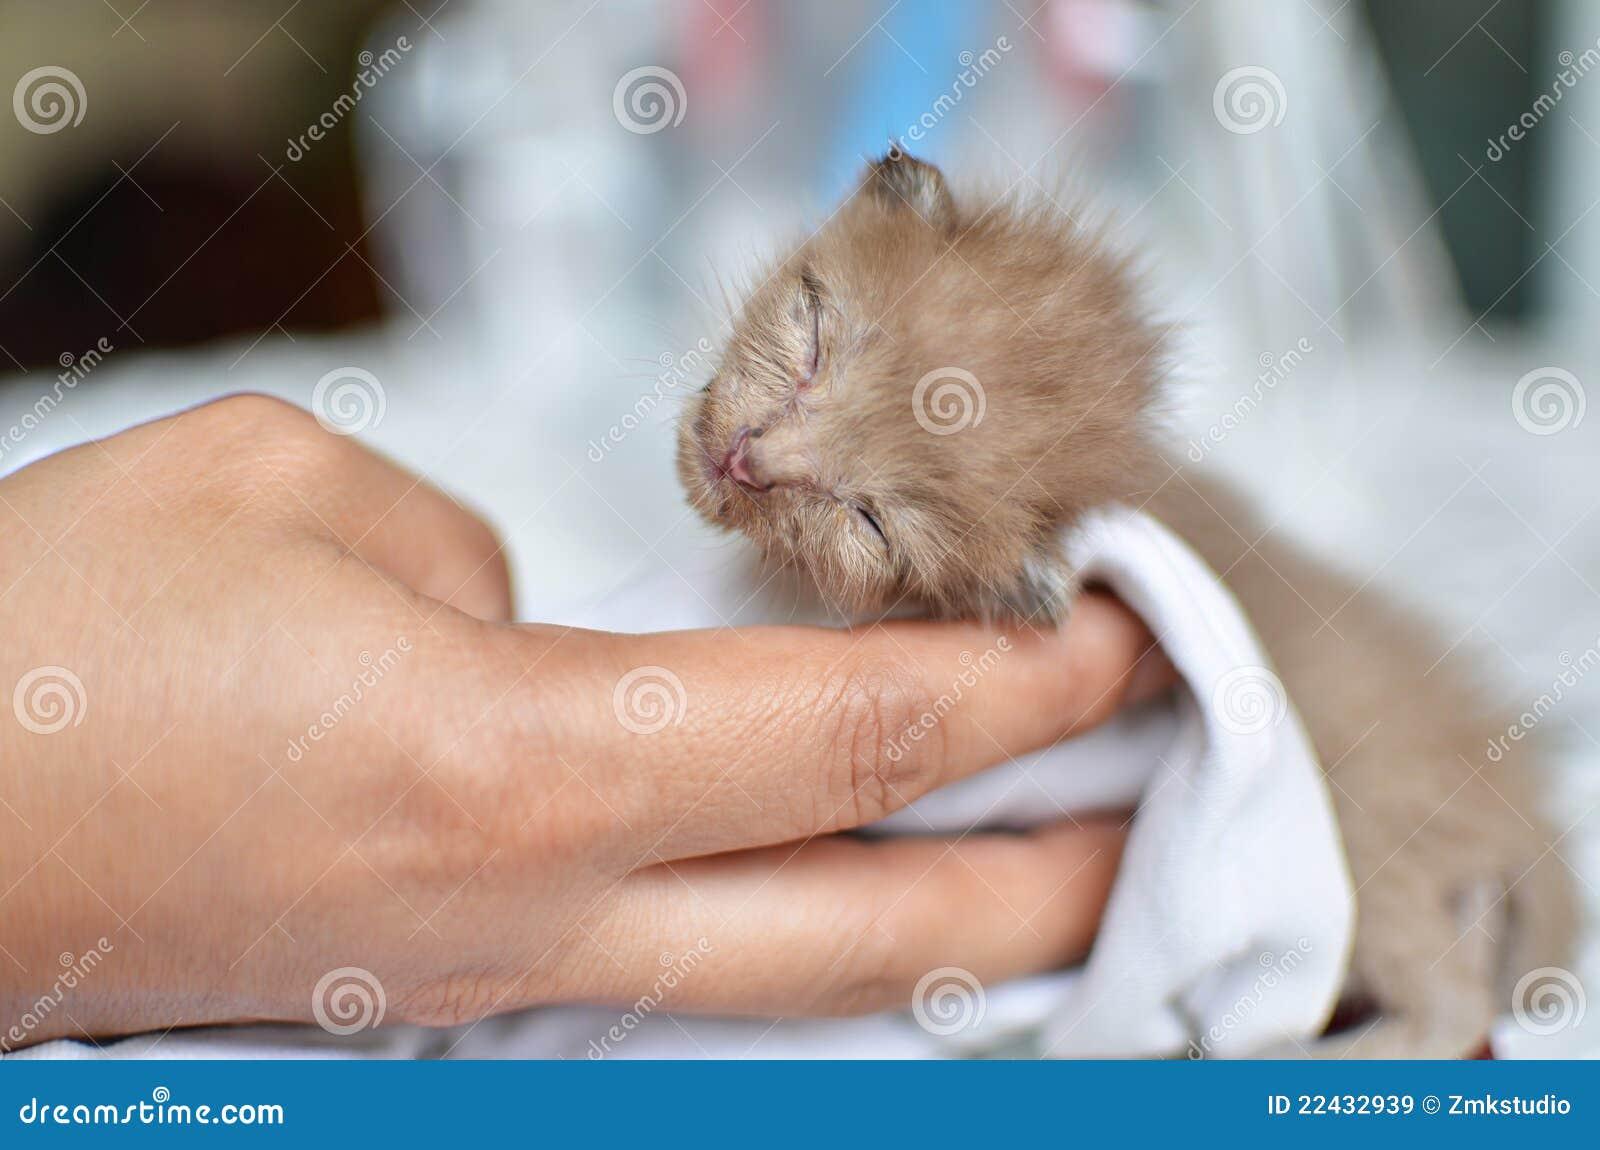 Pin Cute Baby Kittens Sleeping on Pinterest